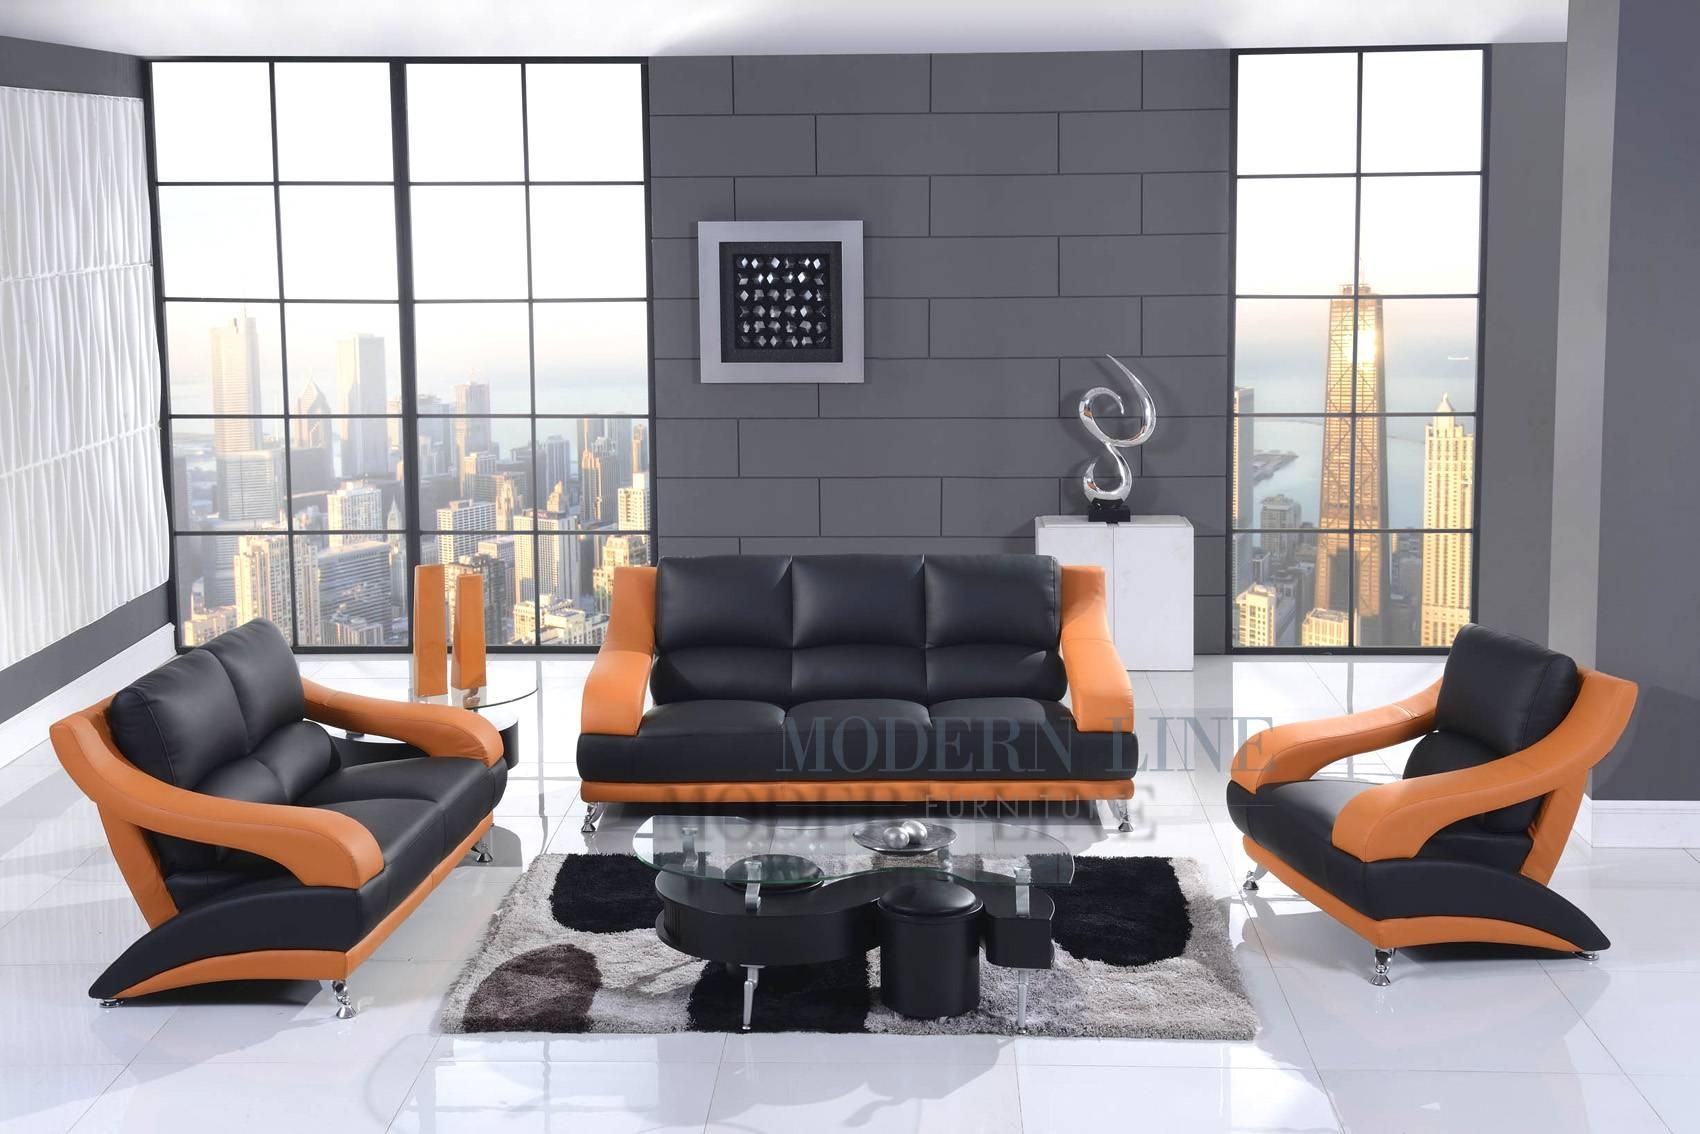 Orange Living Room Set | Home Design Ideas Regarding Orange Sofa Chairs (View 12 of 15)